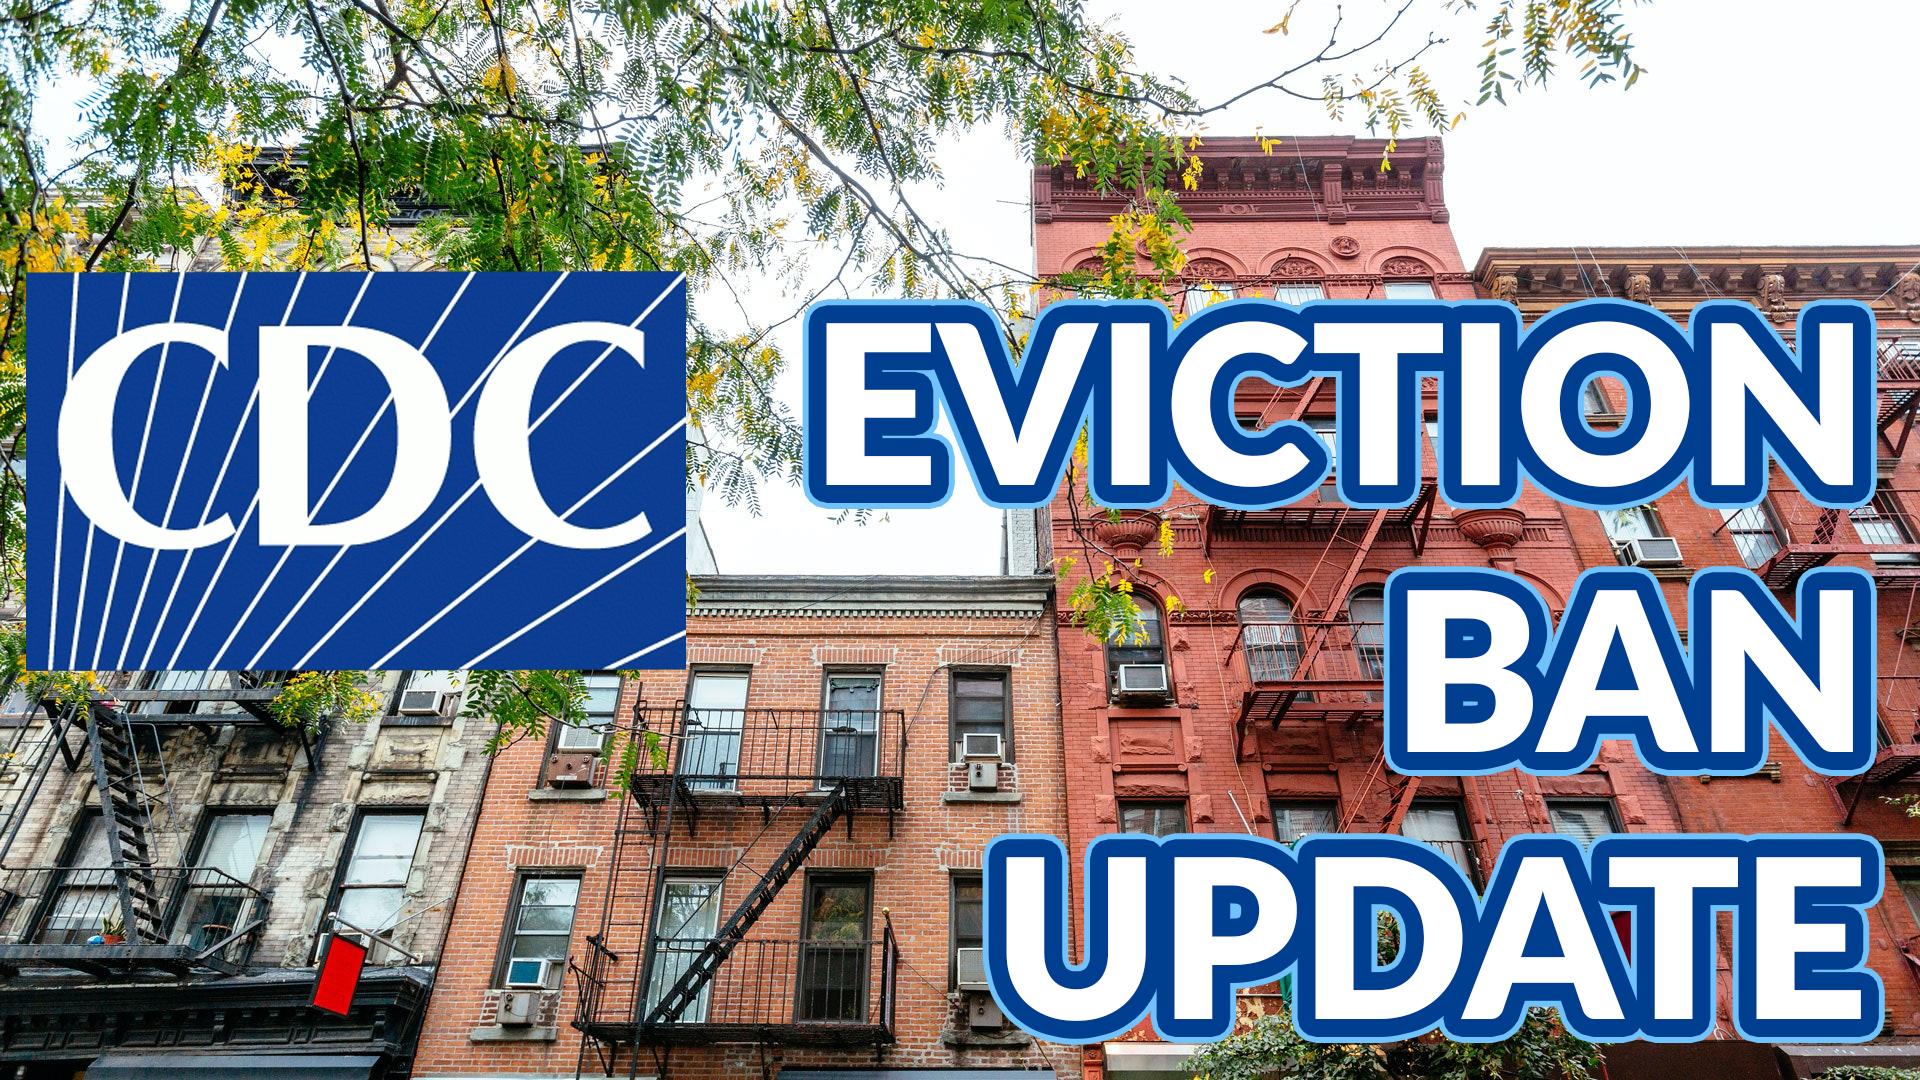 174. CDC Eviction Moratorium Update with Attorney Doug Tate